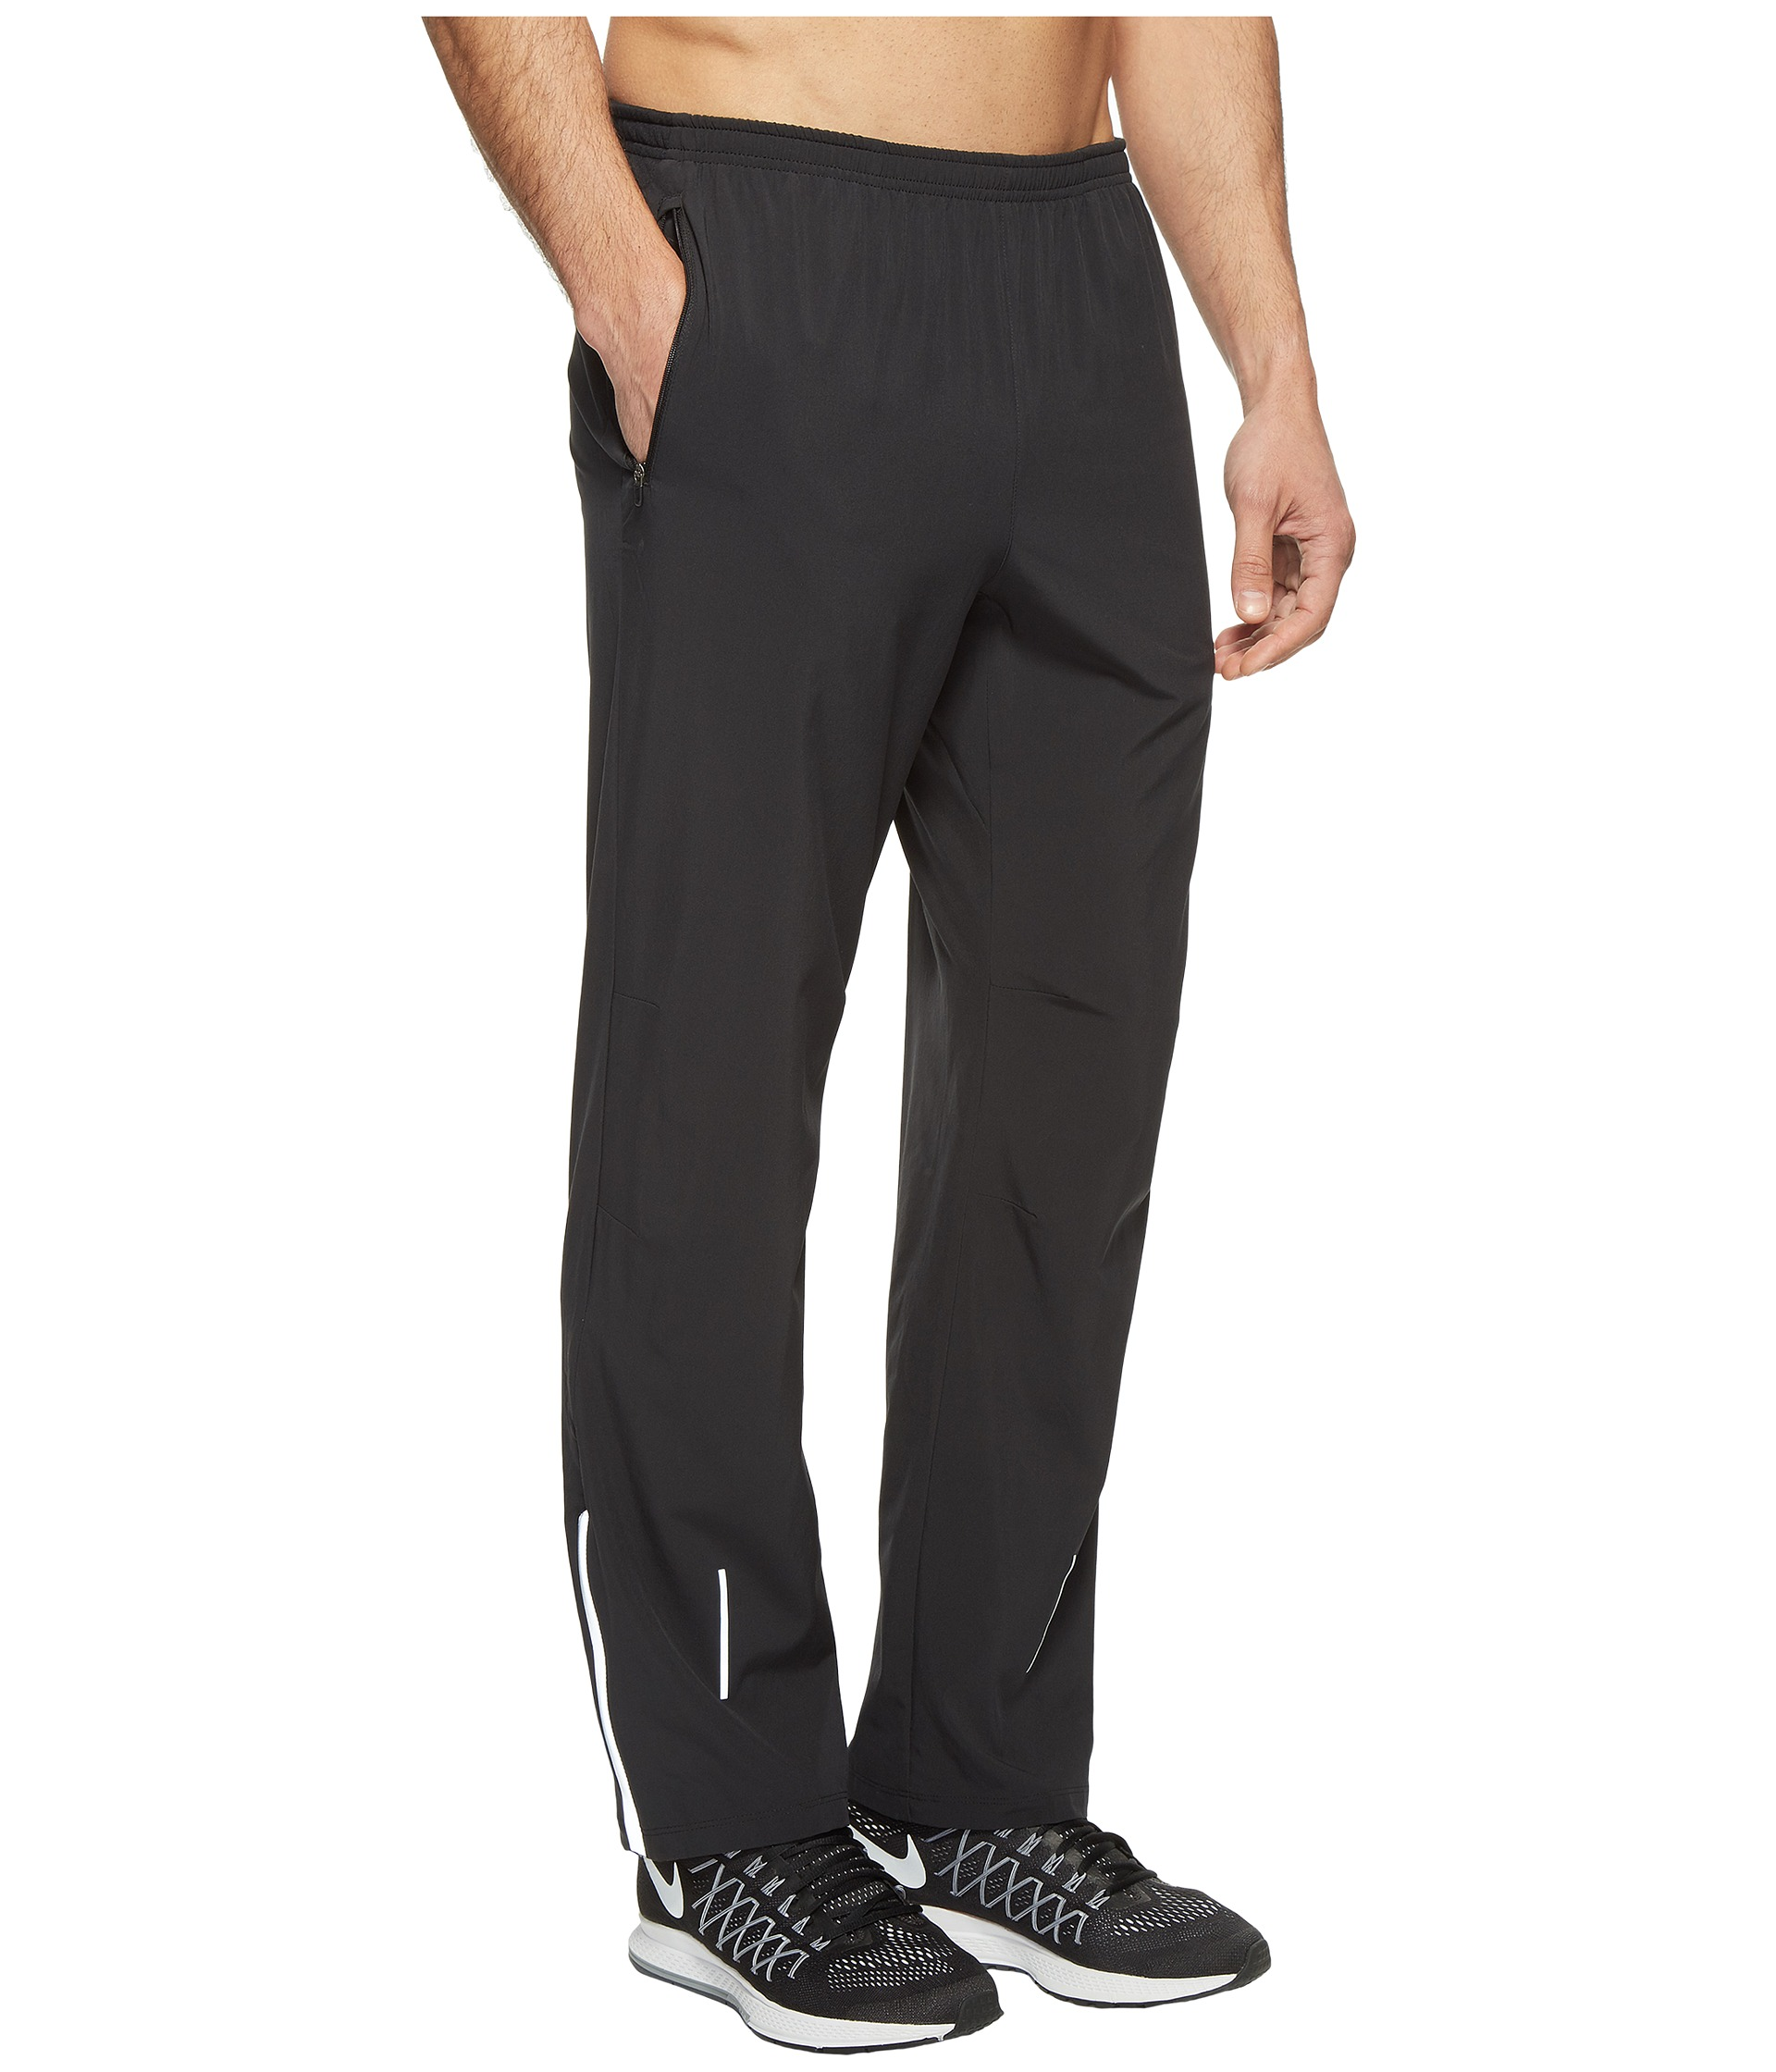 Nike Flex Running Pant at Zappos.com